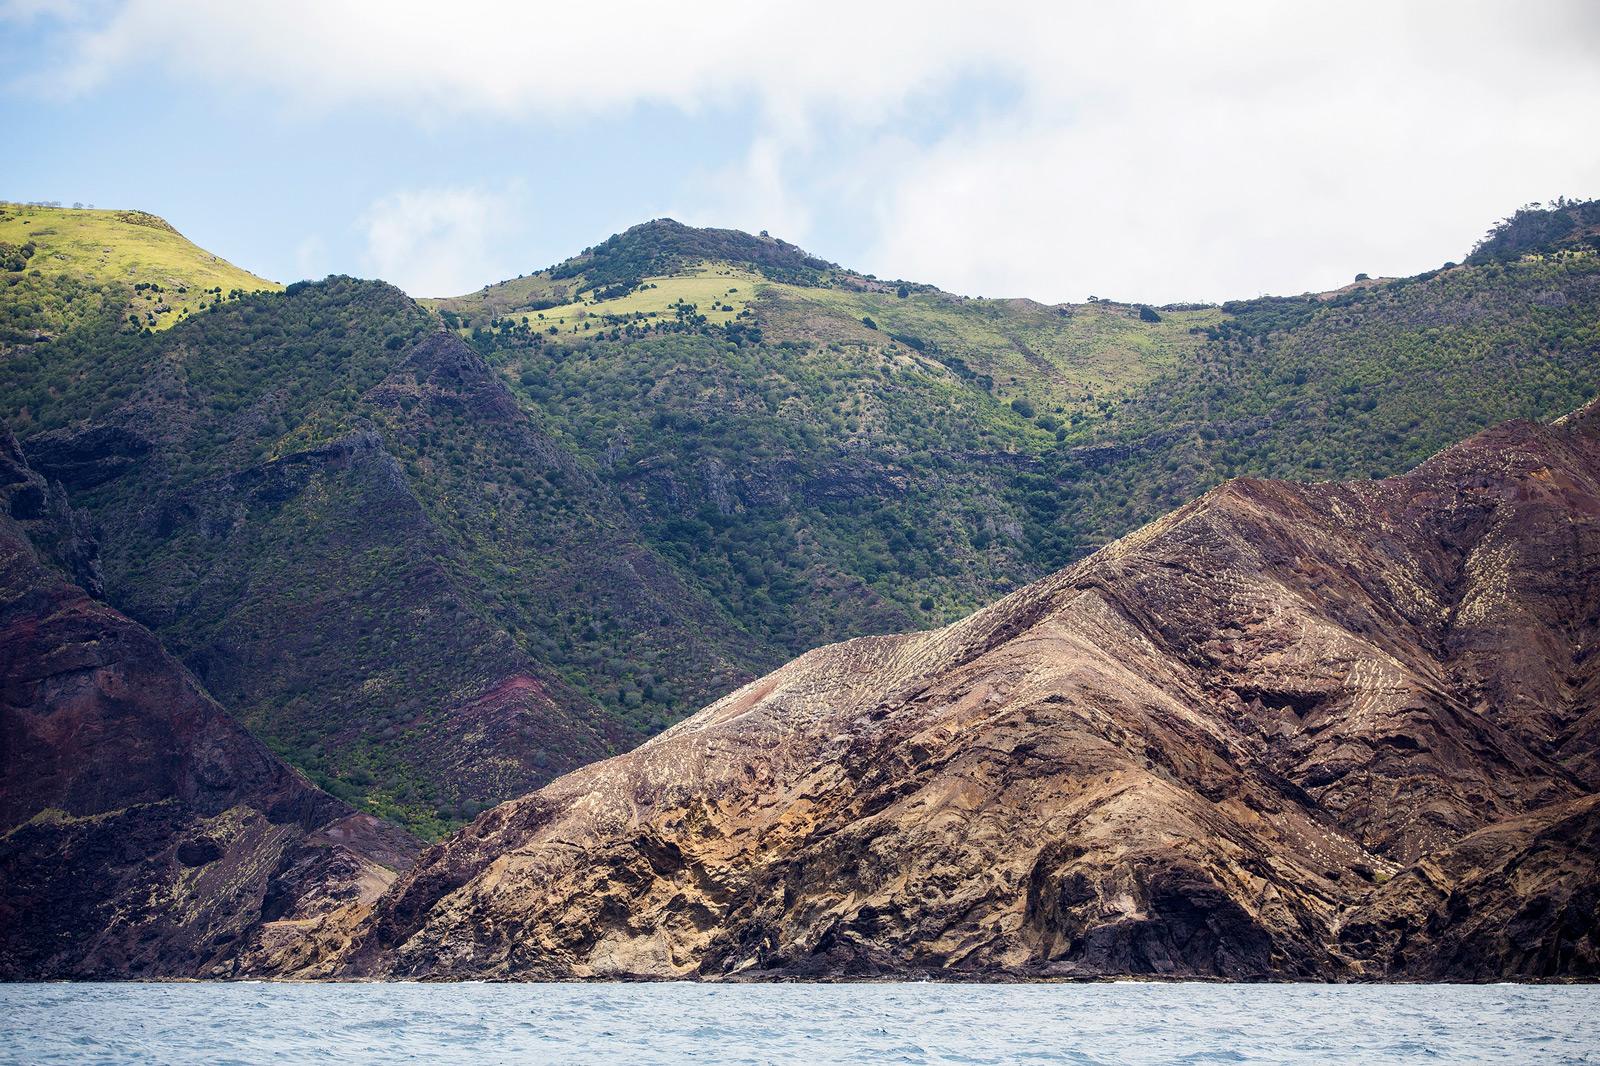 Coastline of St. Helena island